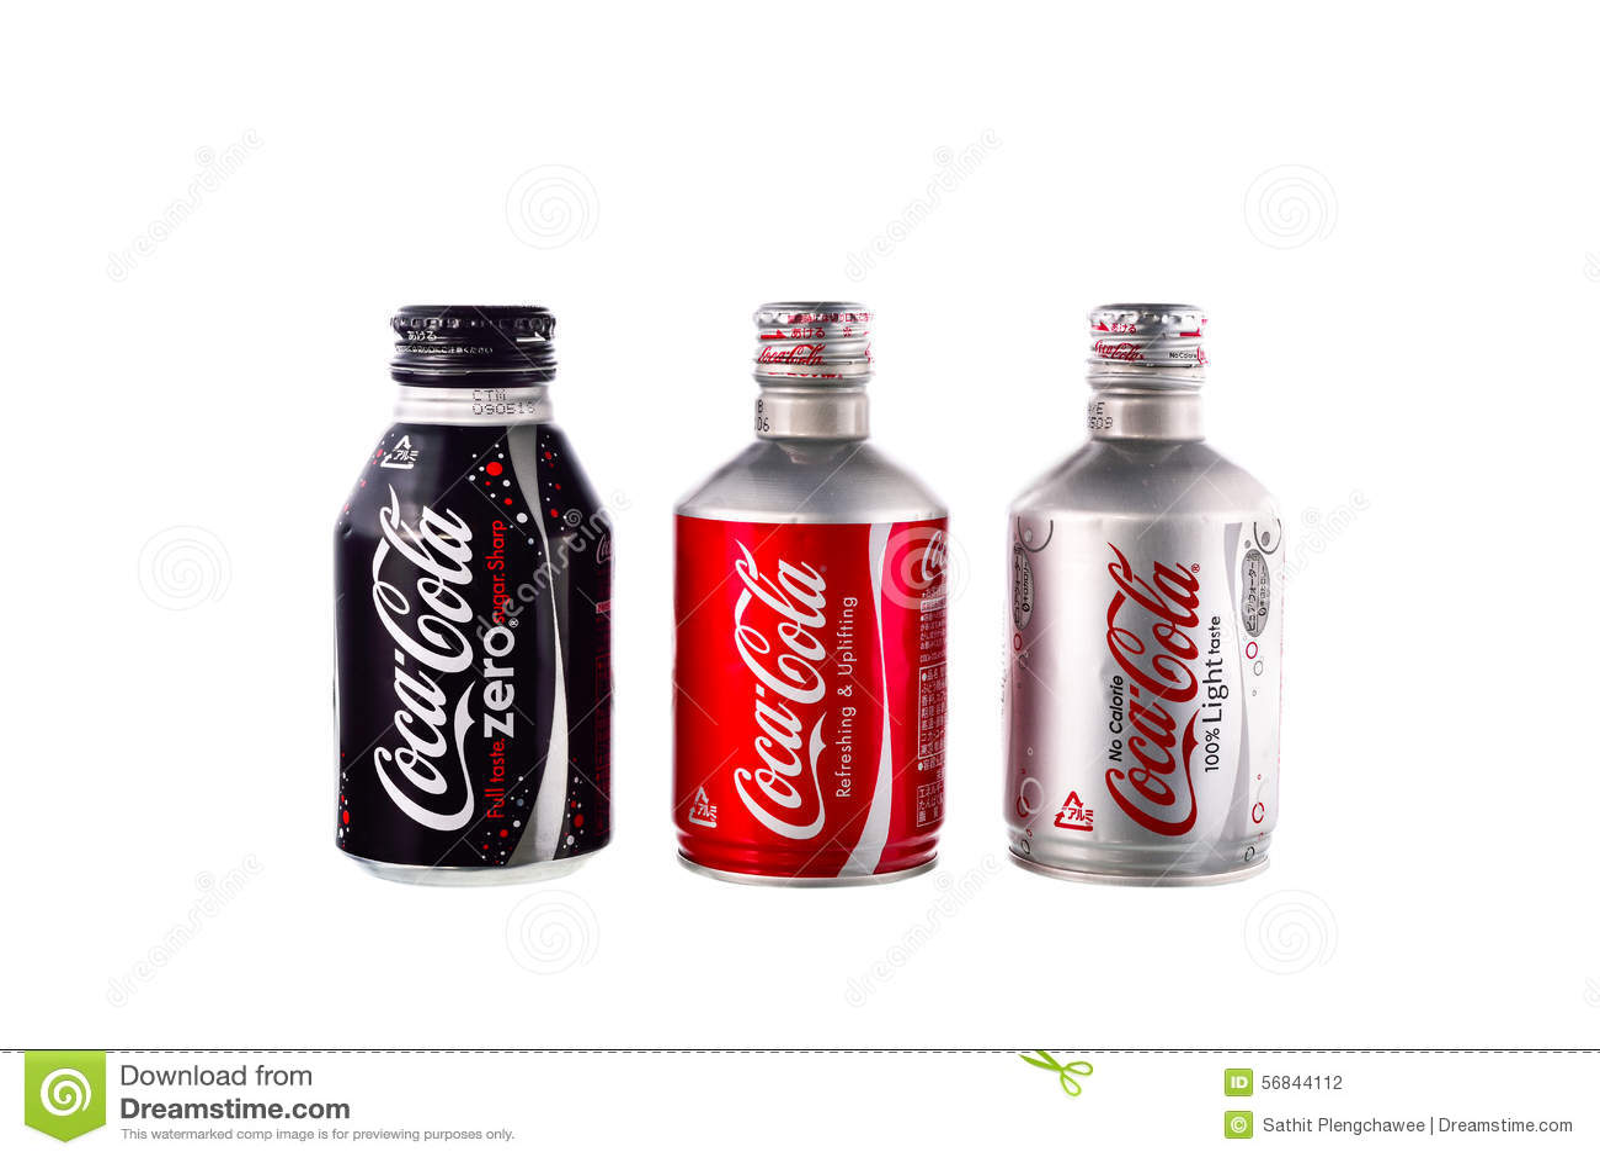 Coke expiration date in Sydney